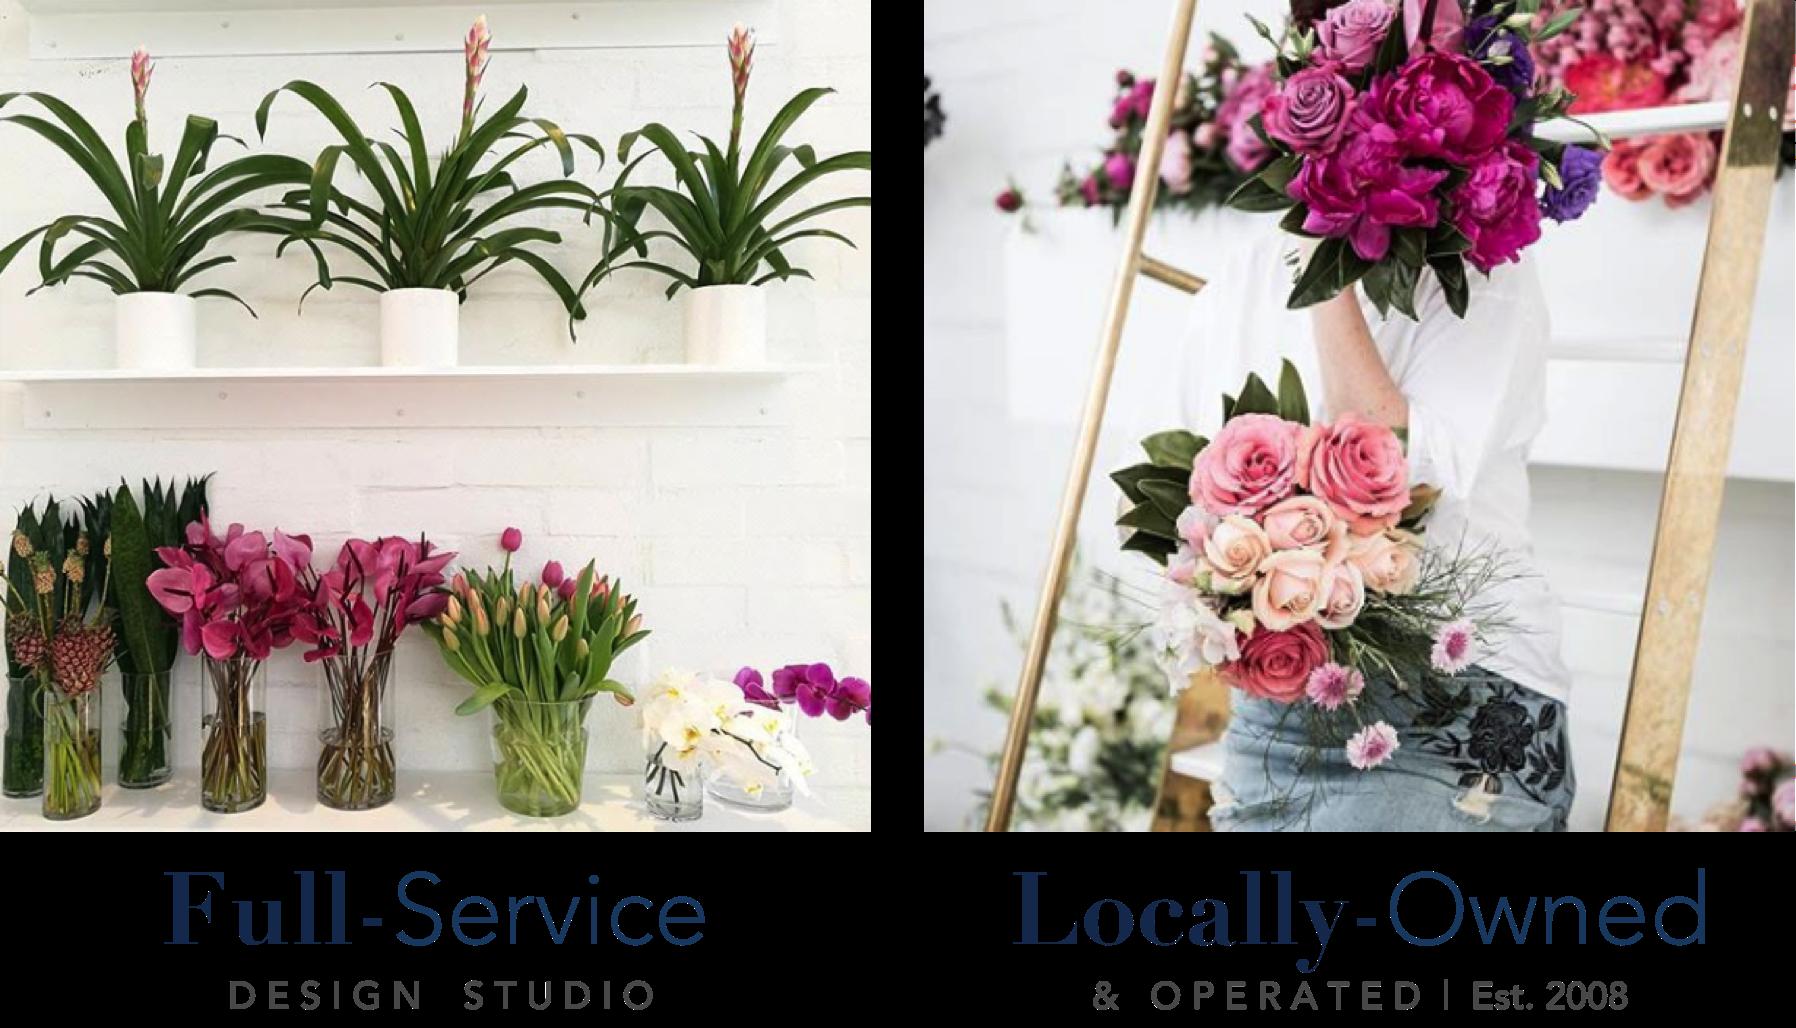 0-angies-floral-designs-el-paso-floral-design-studio-flowershop-el-paso-florist-.png